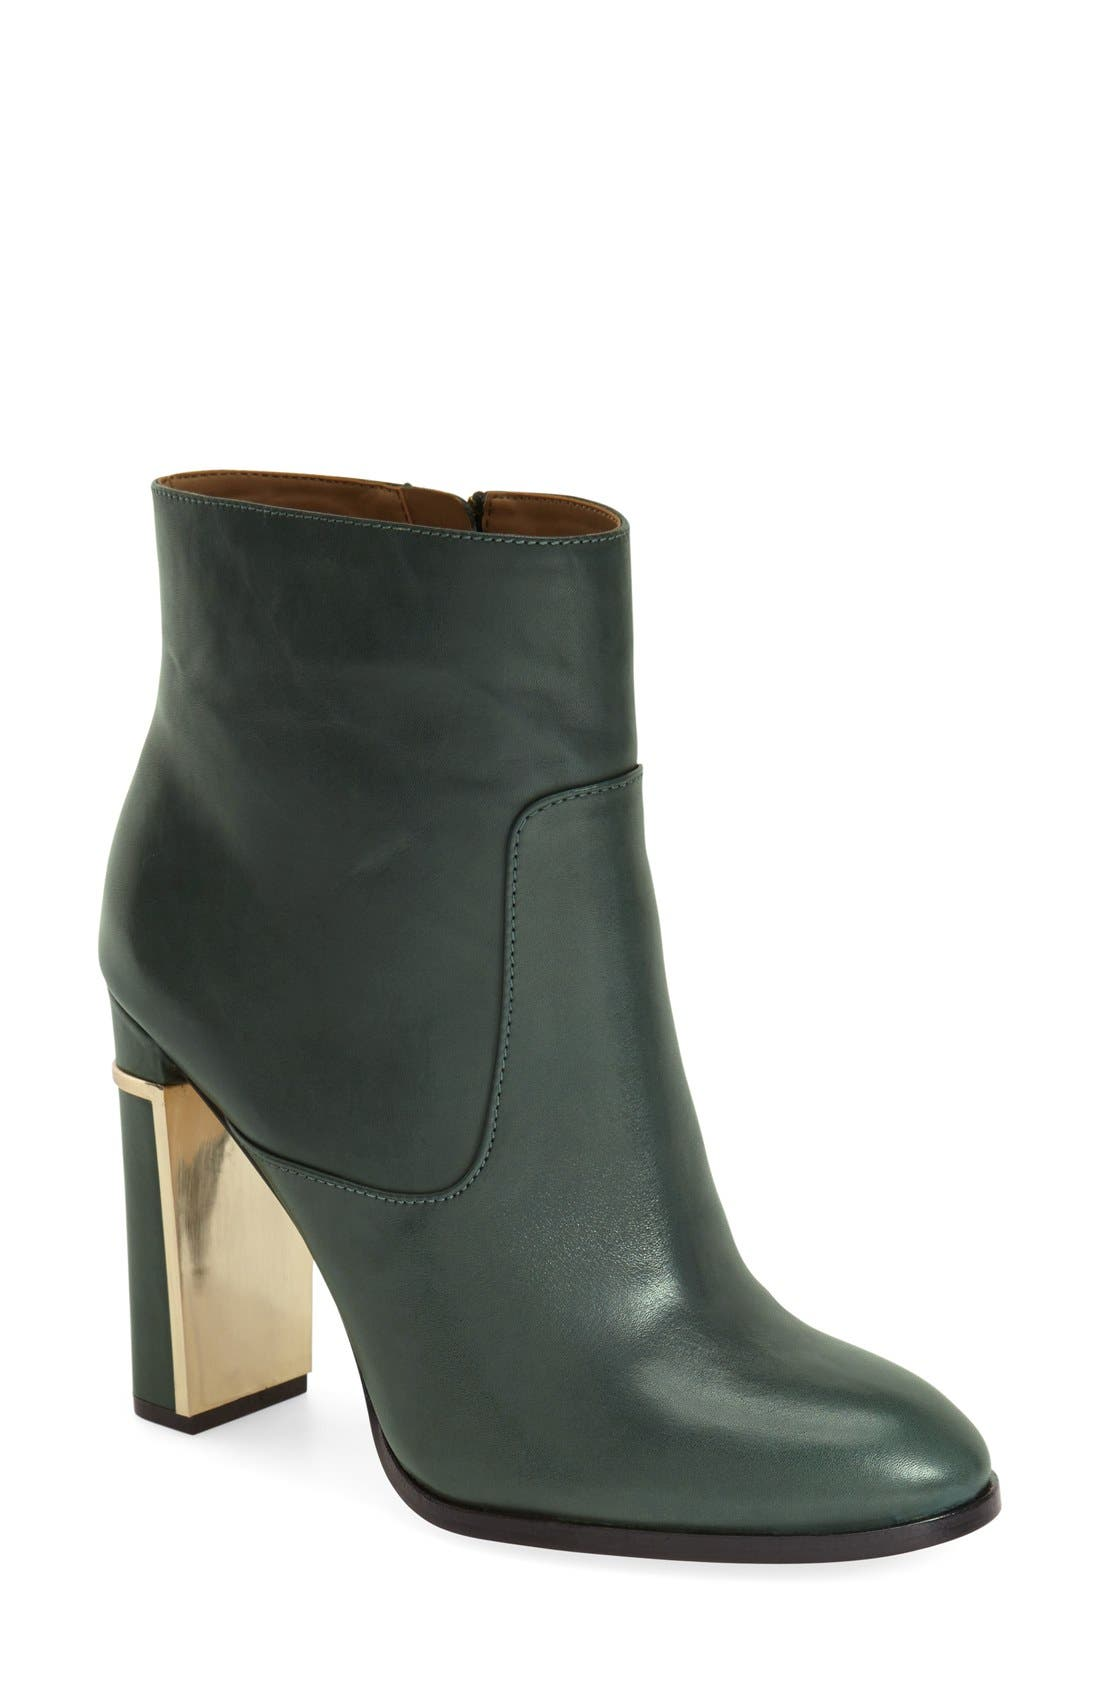 Main Image - Calvin Klein 'Karlia' Ankle Bootie(Women)